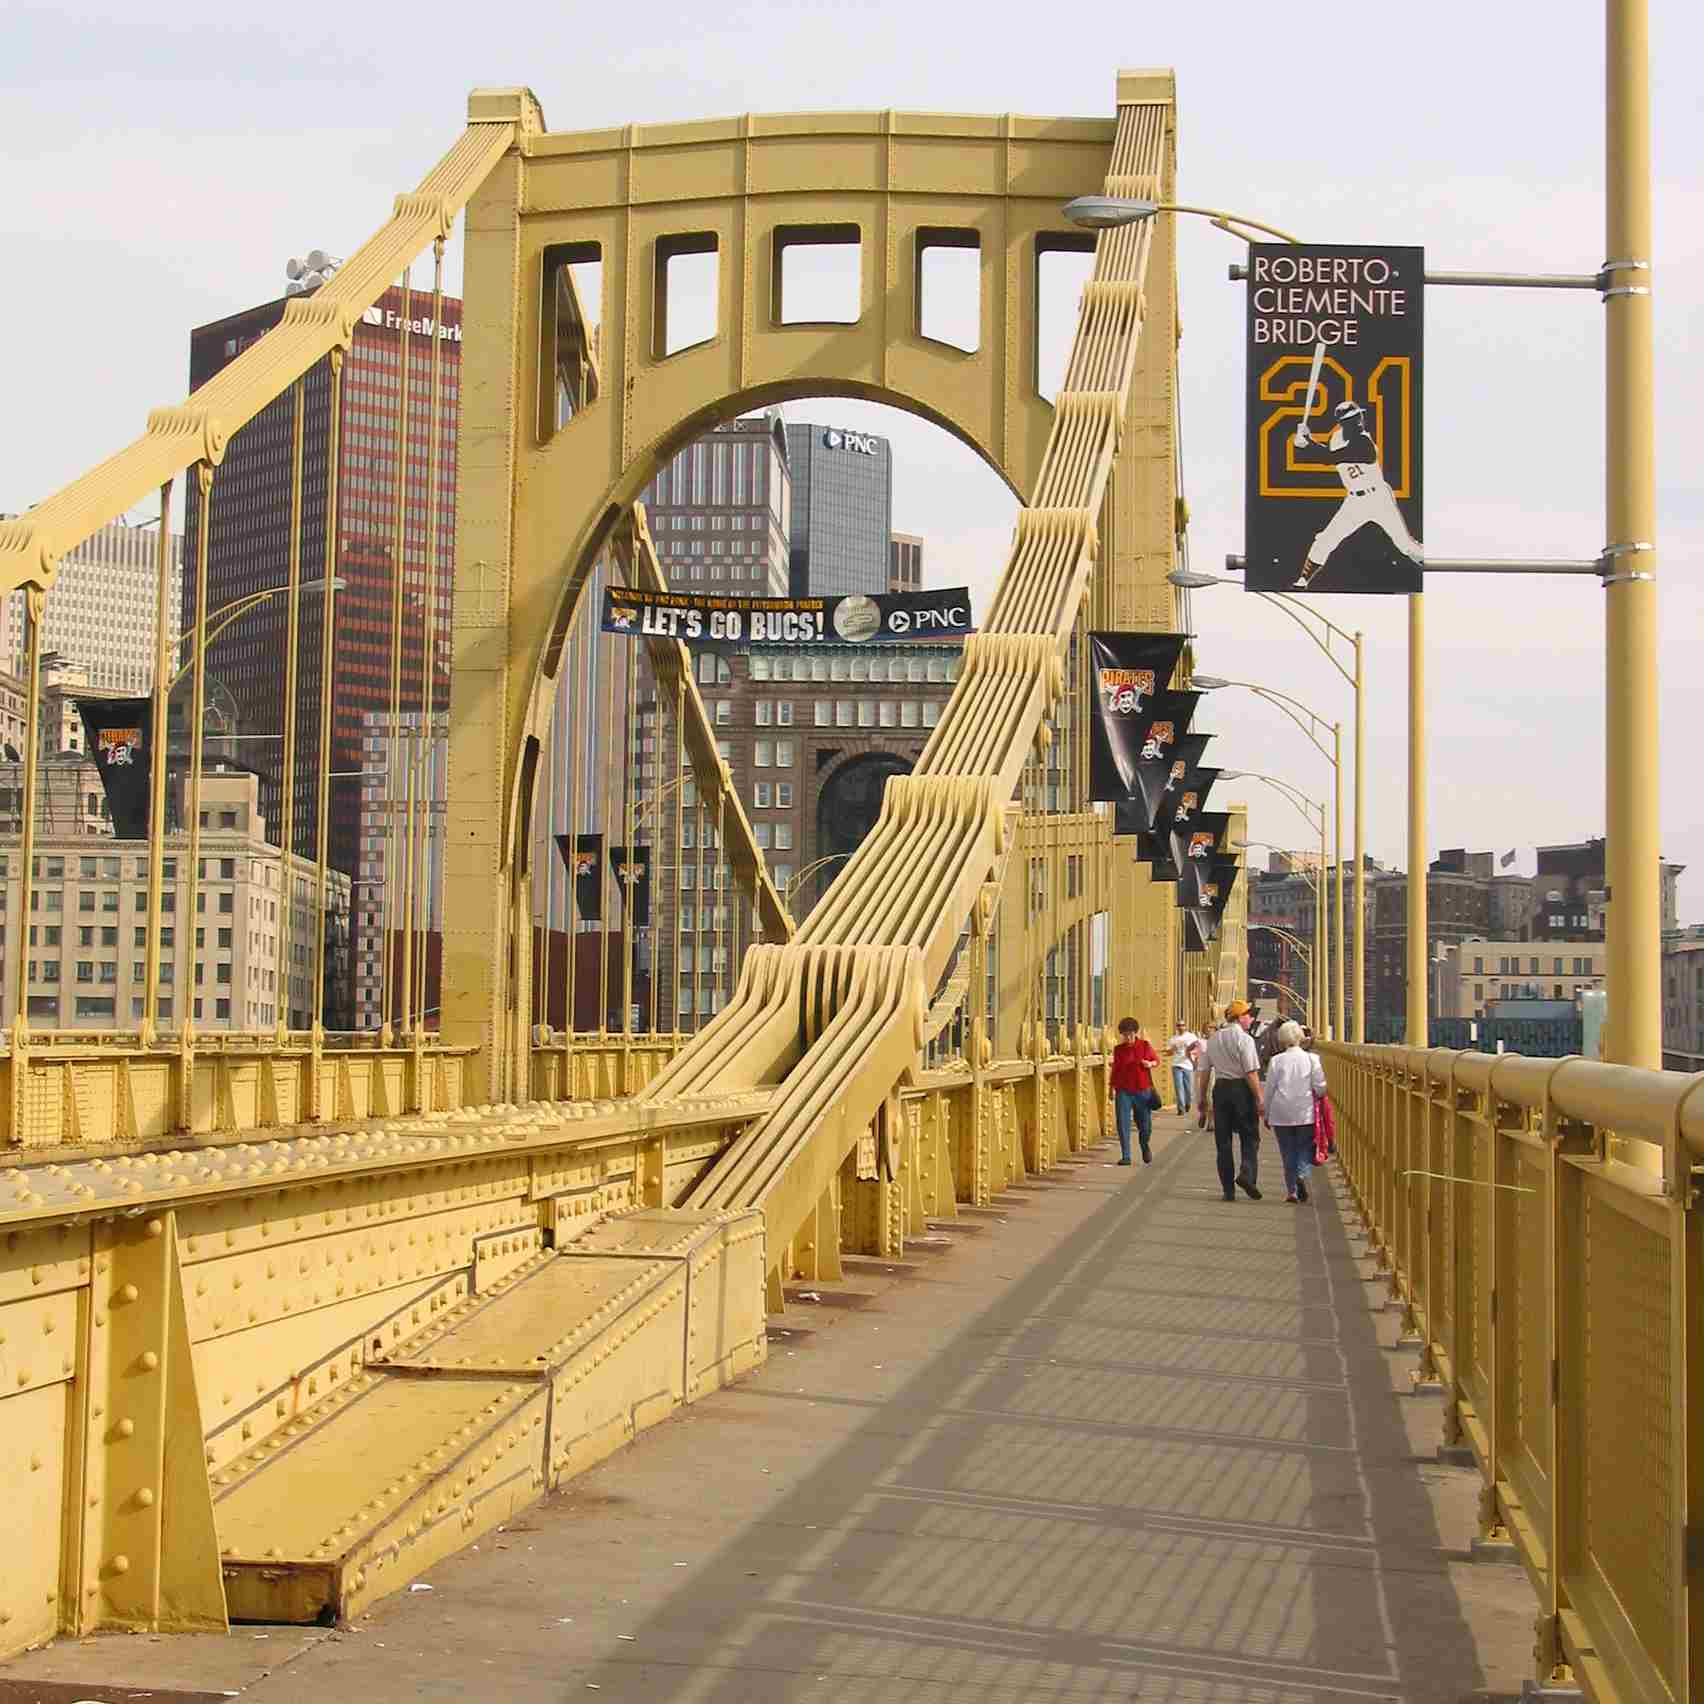 The Roberto Clemente Bridge